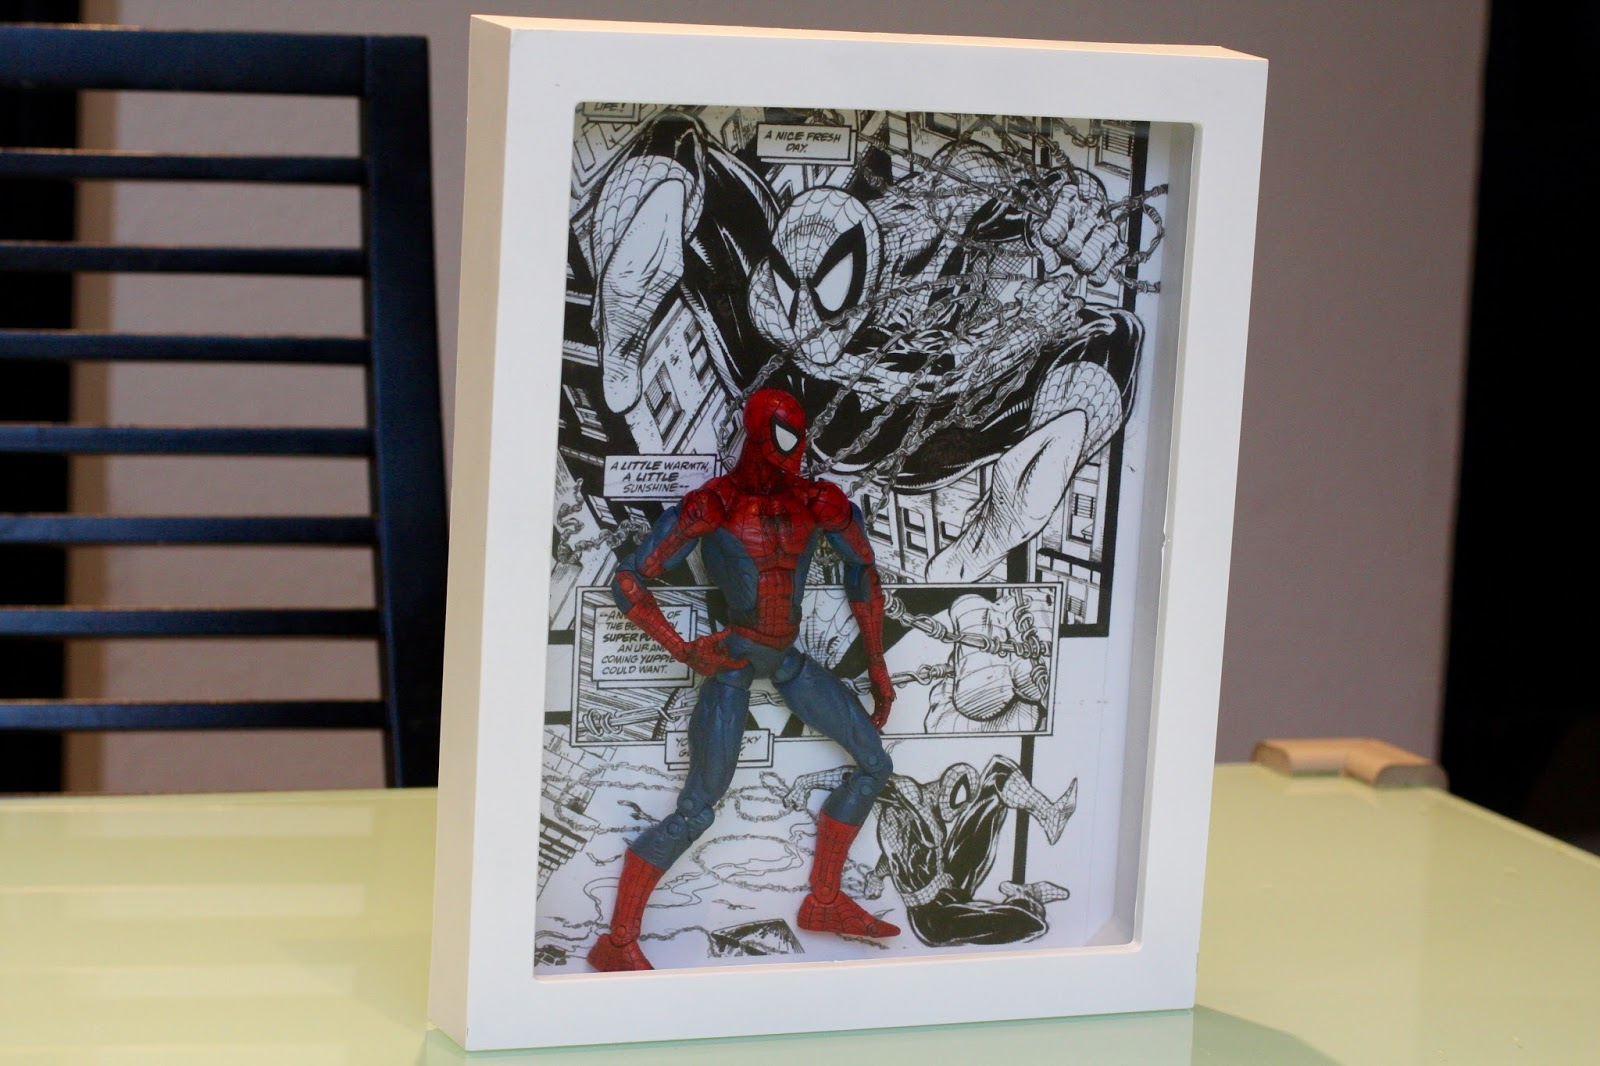 Geek Diy Bam Spider Man Action Figure Shadow Box Display